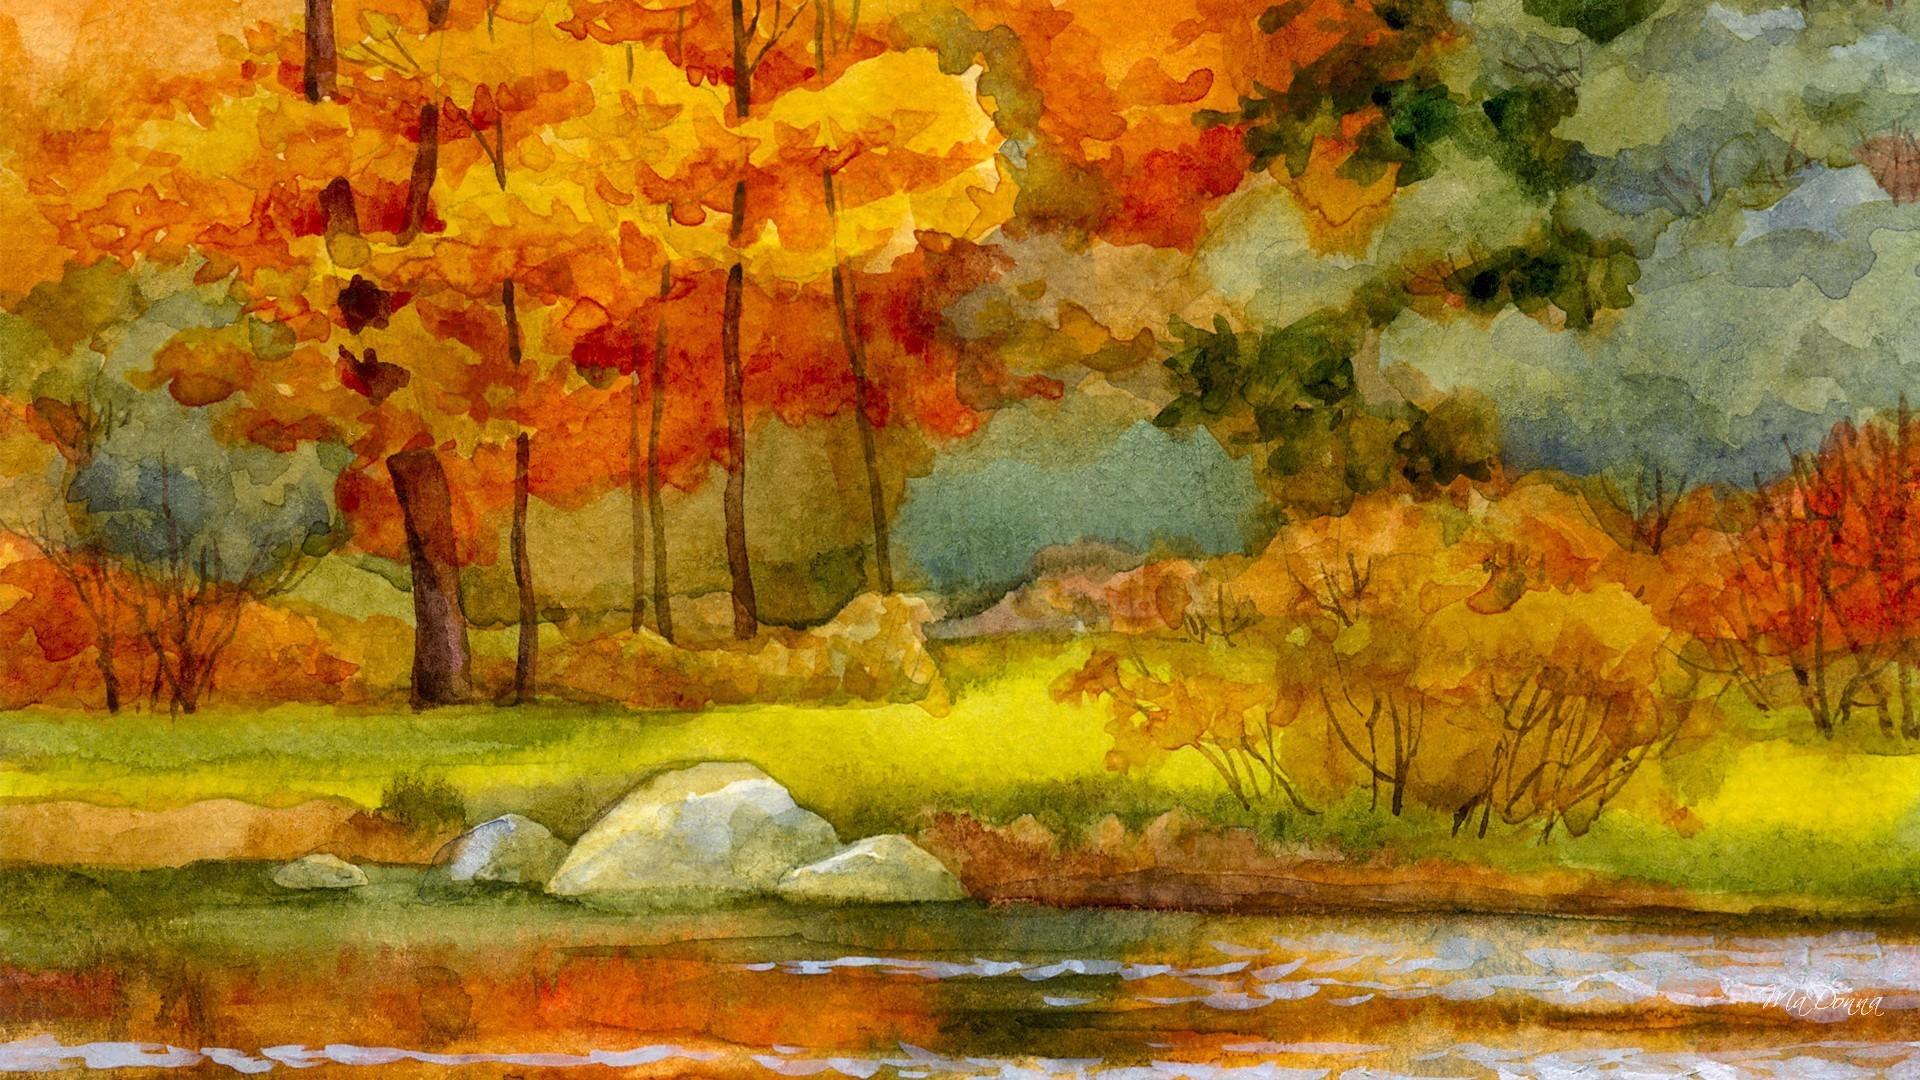 Autumn River Watercolor Wallpaper - Watercolor Autumn Desktop Background , HD Wallpaper & Backgrounds